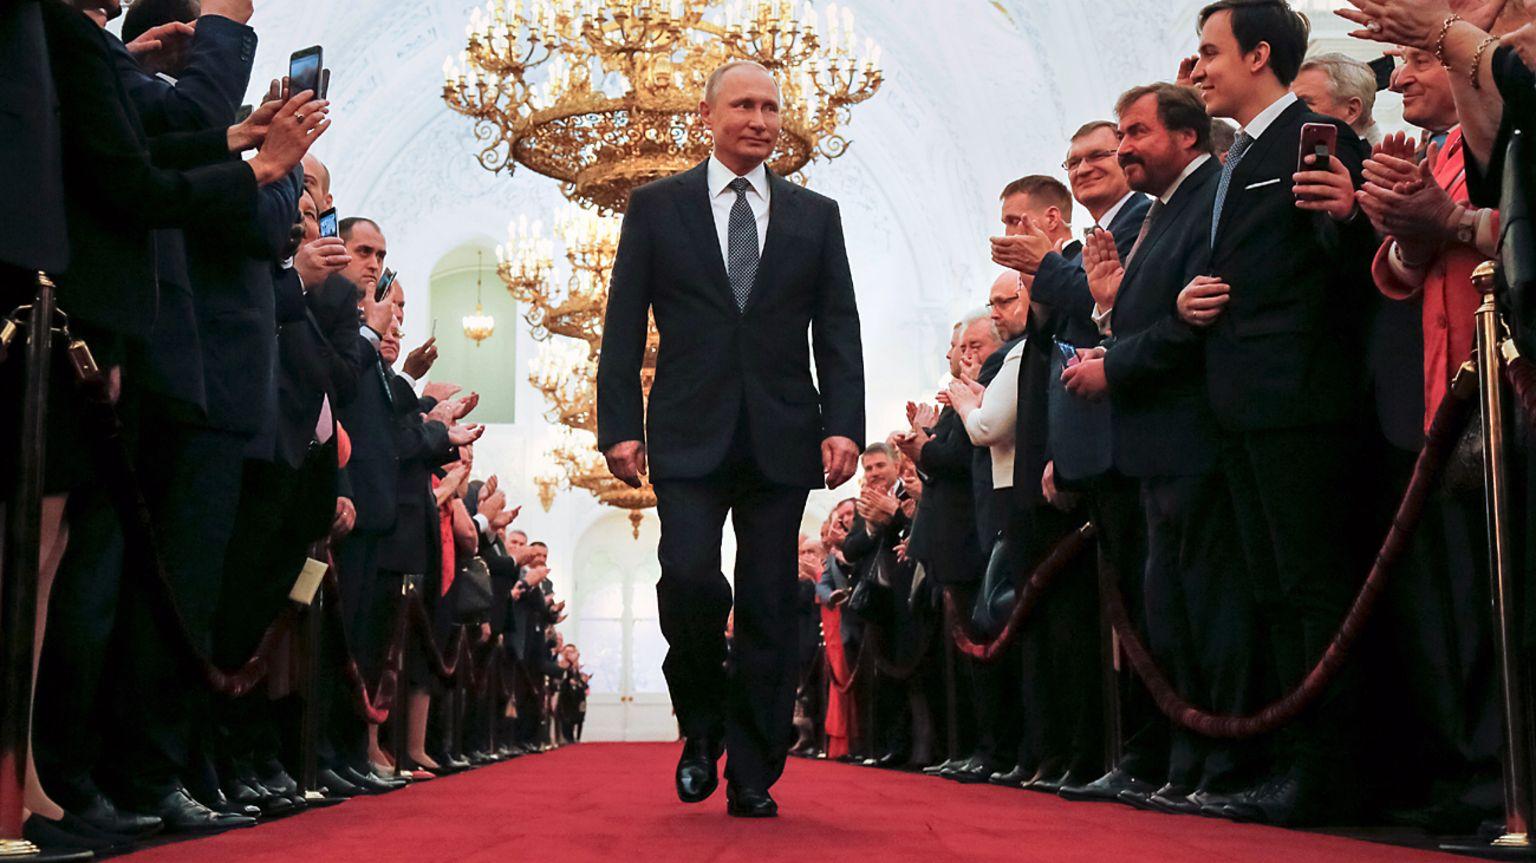 President Putin's inauguration ceremony, May 2018